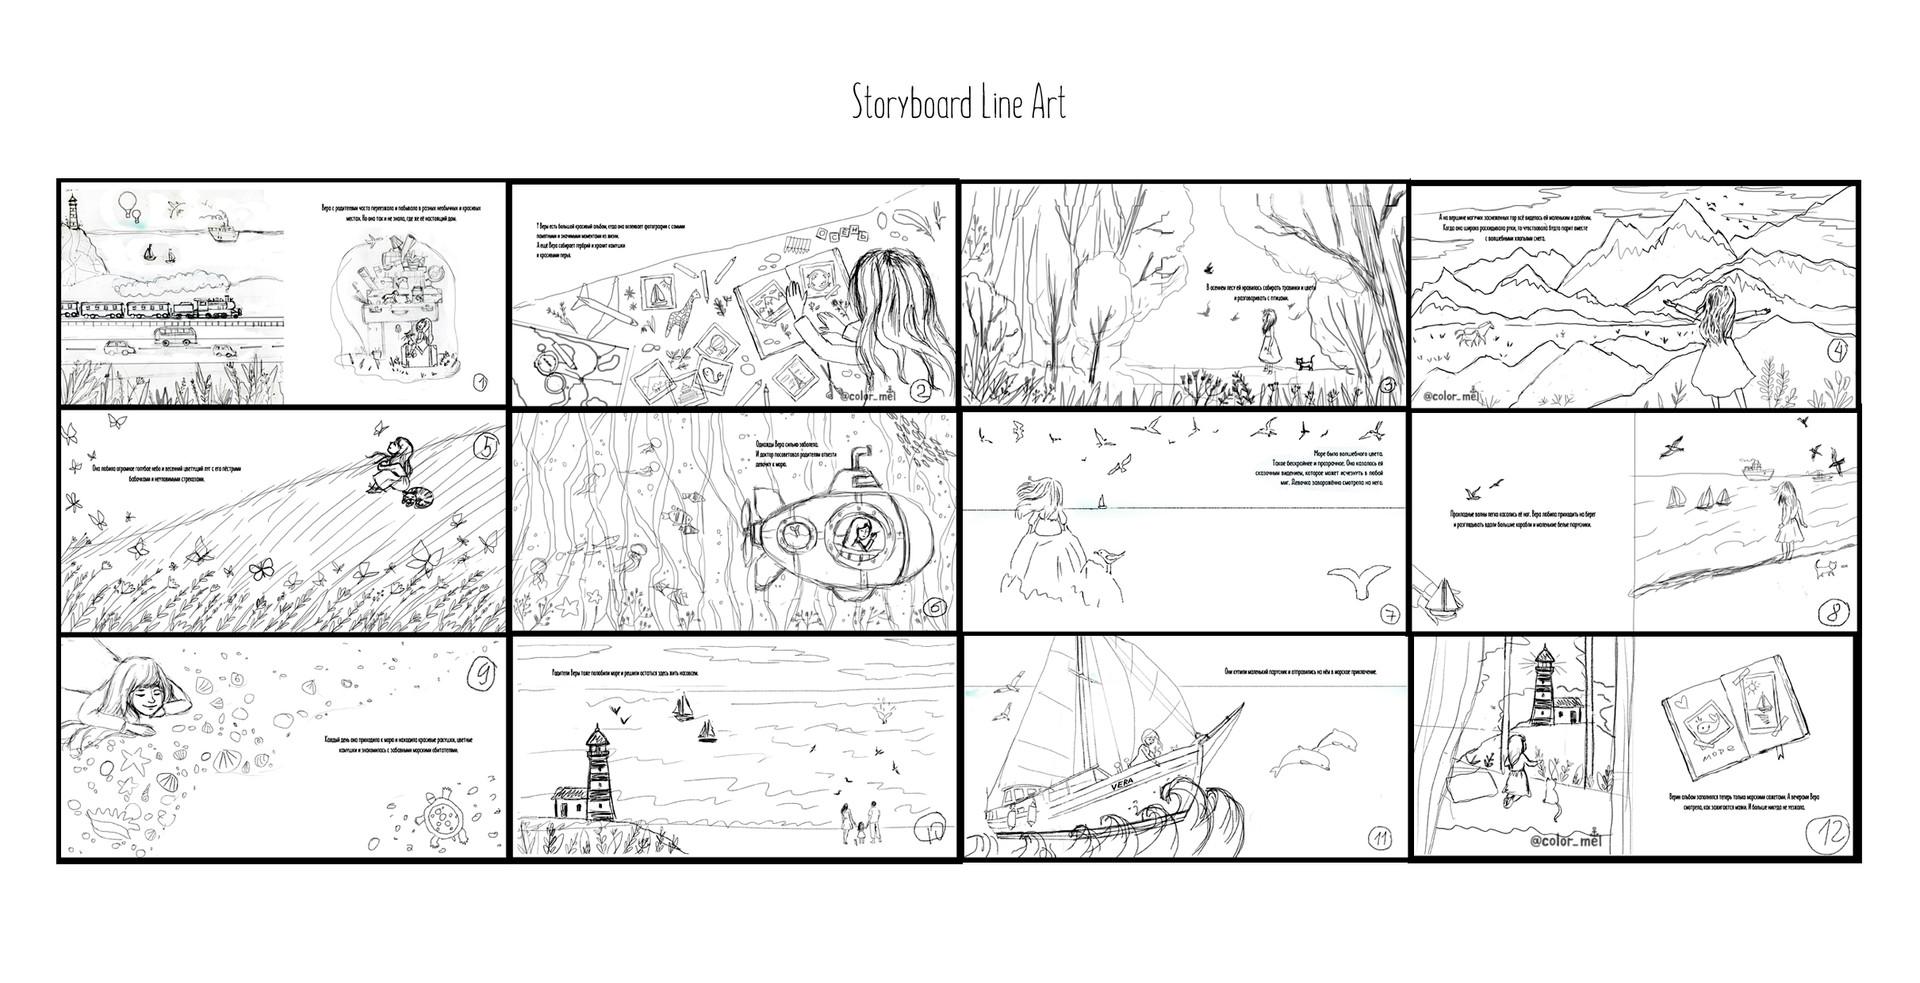 storyboard sketch behance.jpg